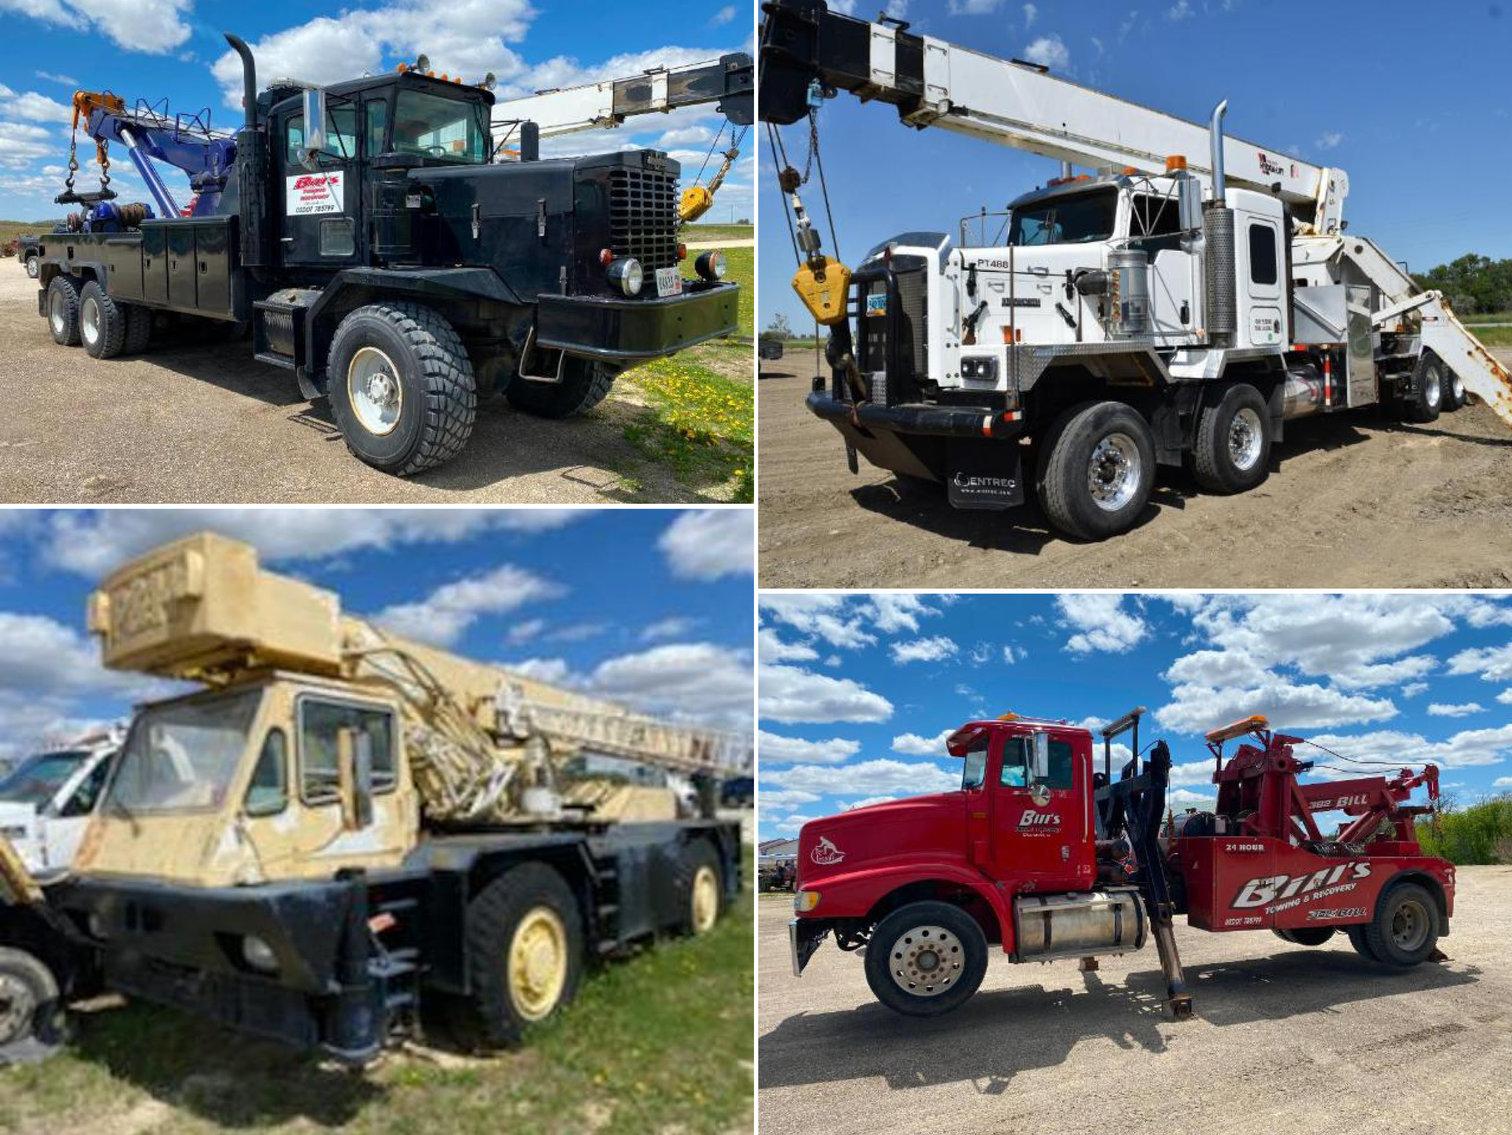 (3) Heavy Haul Trucks, (2) Cranes and Equipment